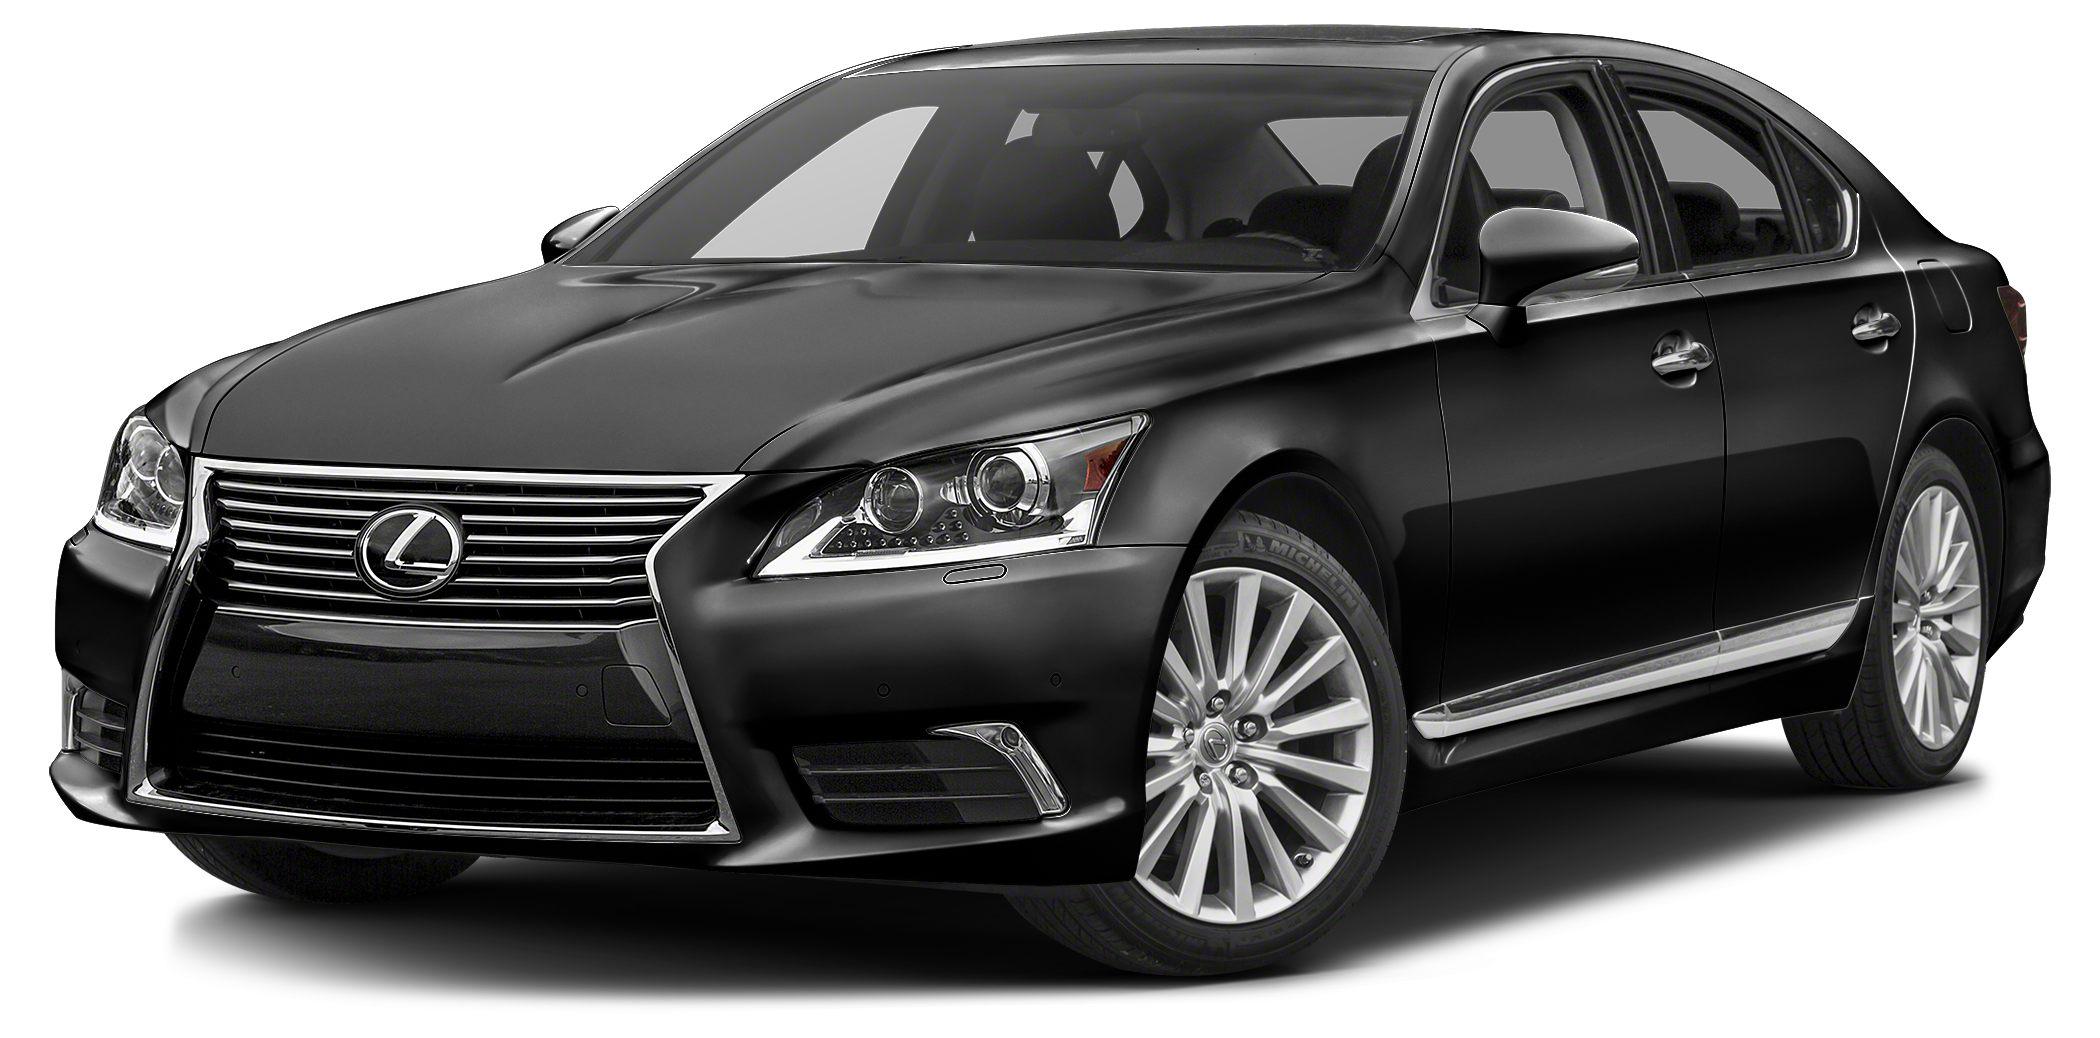 2015 Lexus LS 460 Base This 2015 Lexus LS 460 4dr 4dr Sedan RWD features a 46L 8 CYLINDER 8cyl Ga